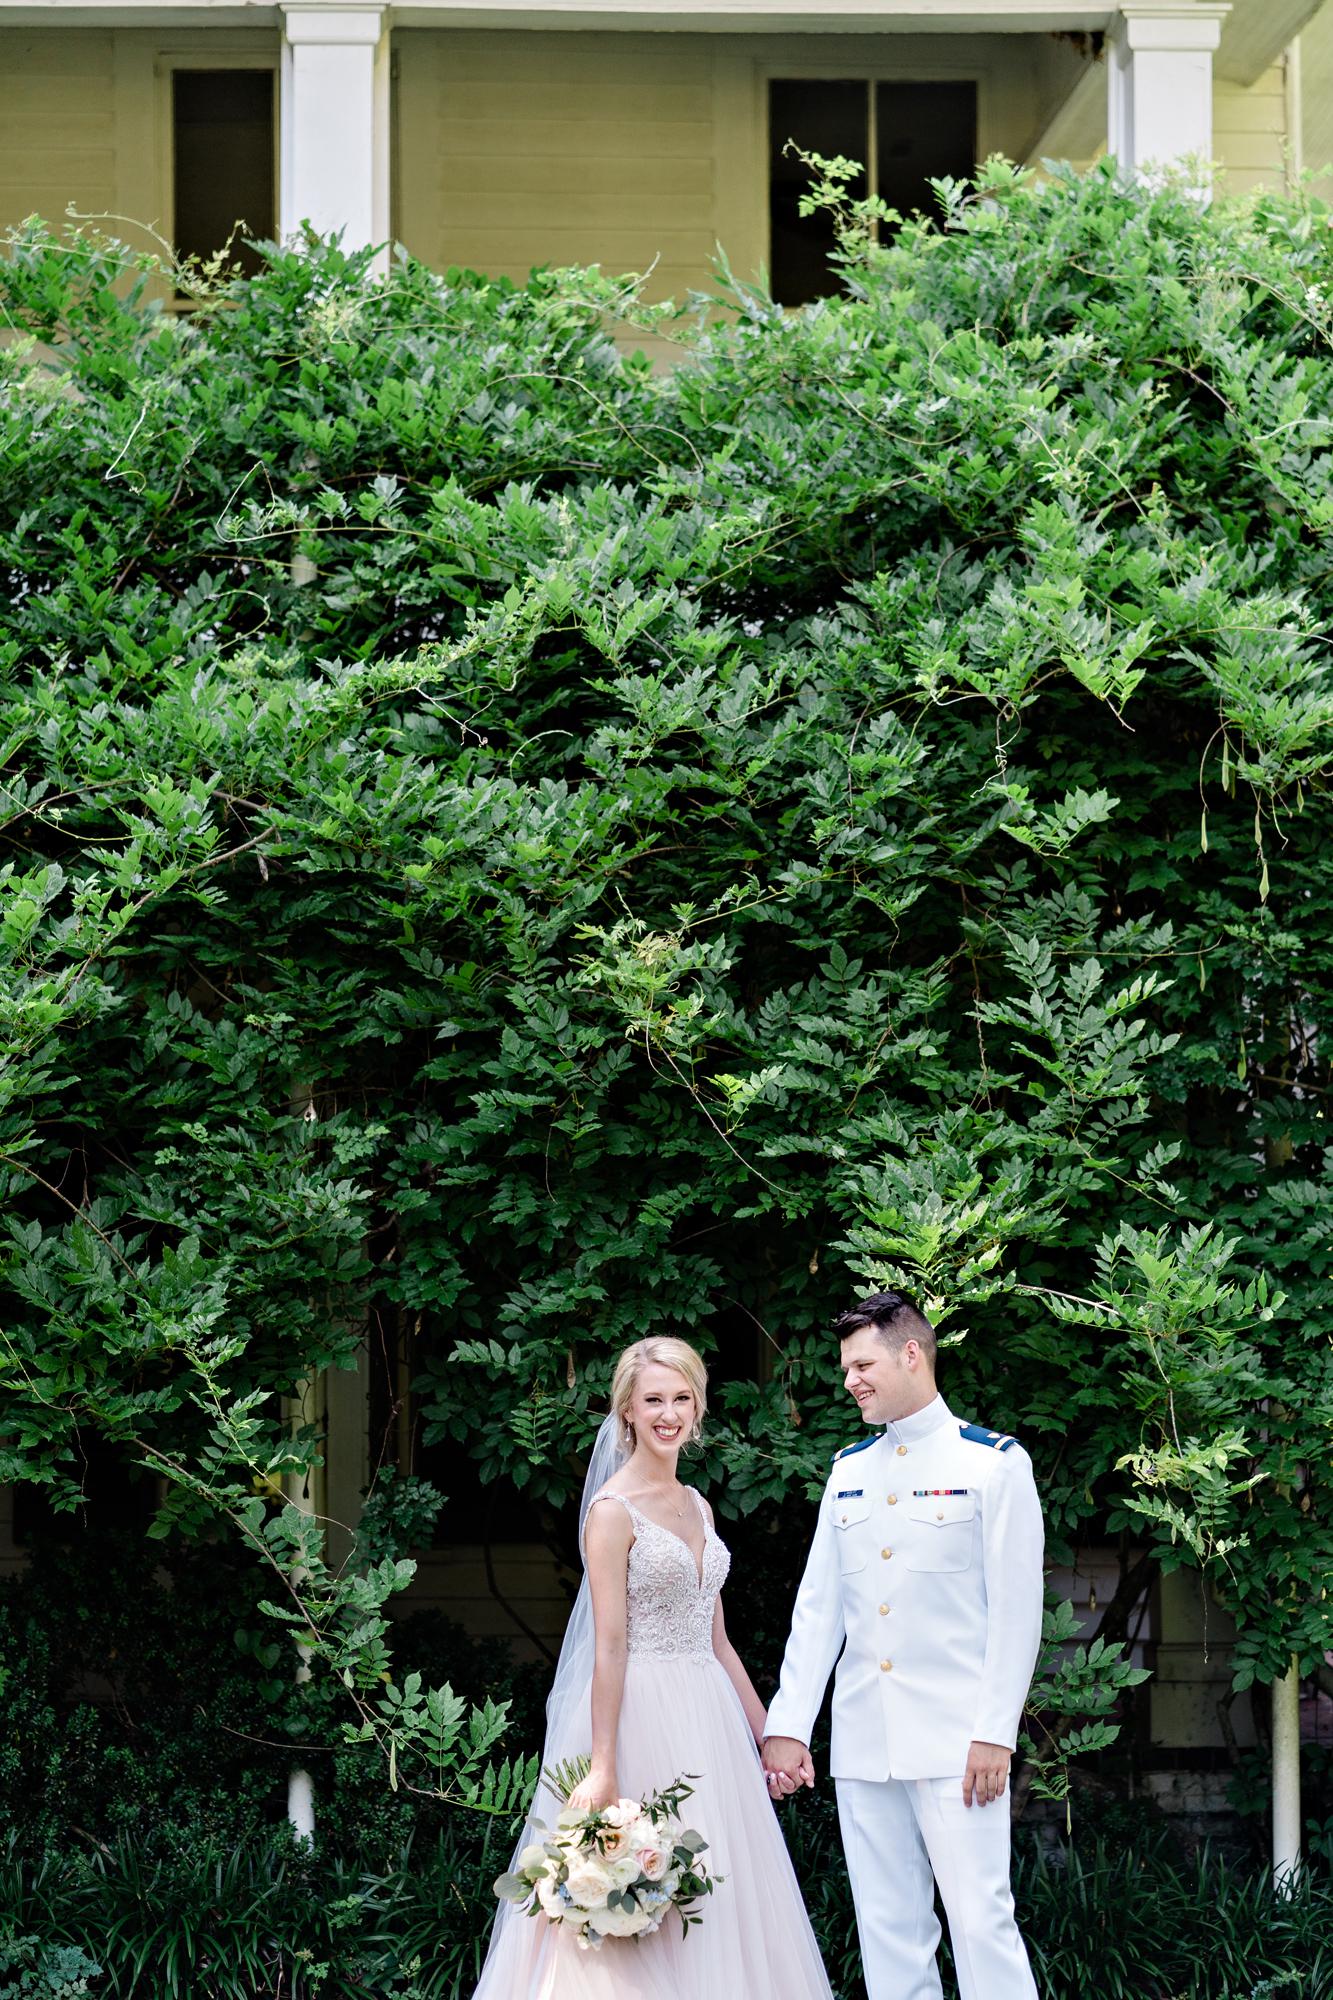 Alabama-Photographers-Nick-Drollette-Wedding-Photography-131.jpg